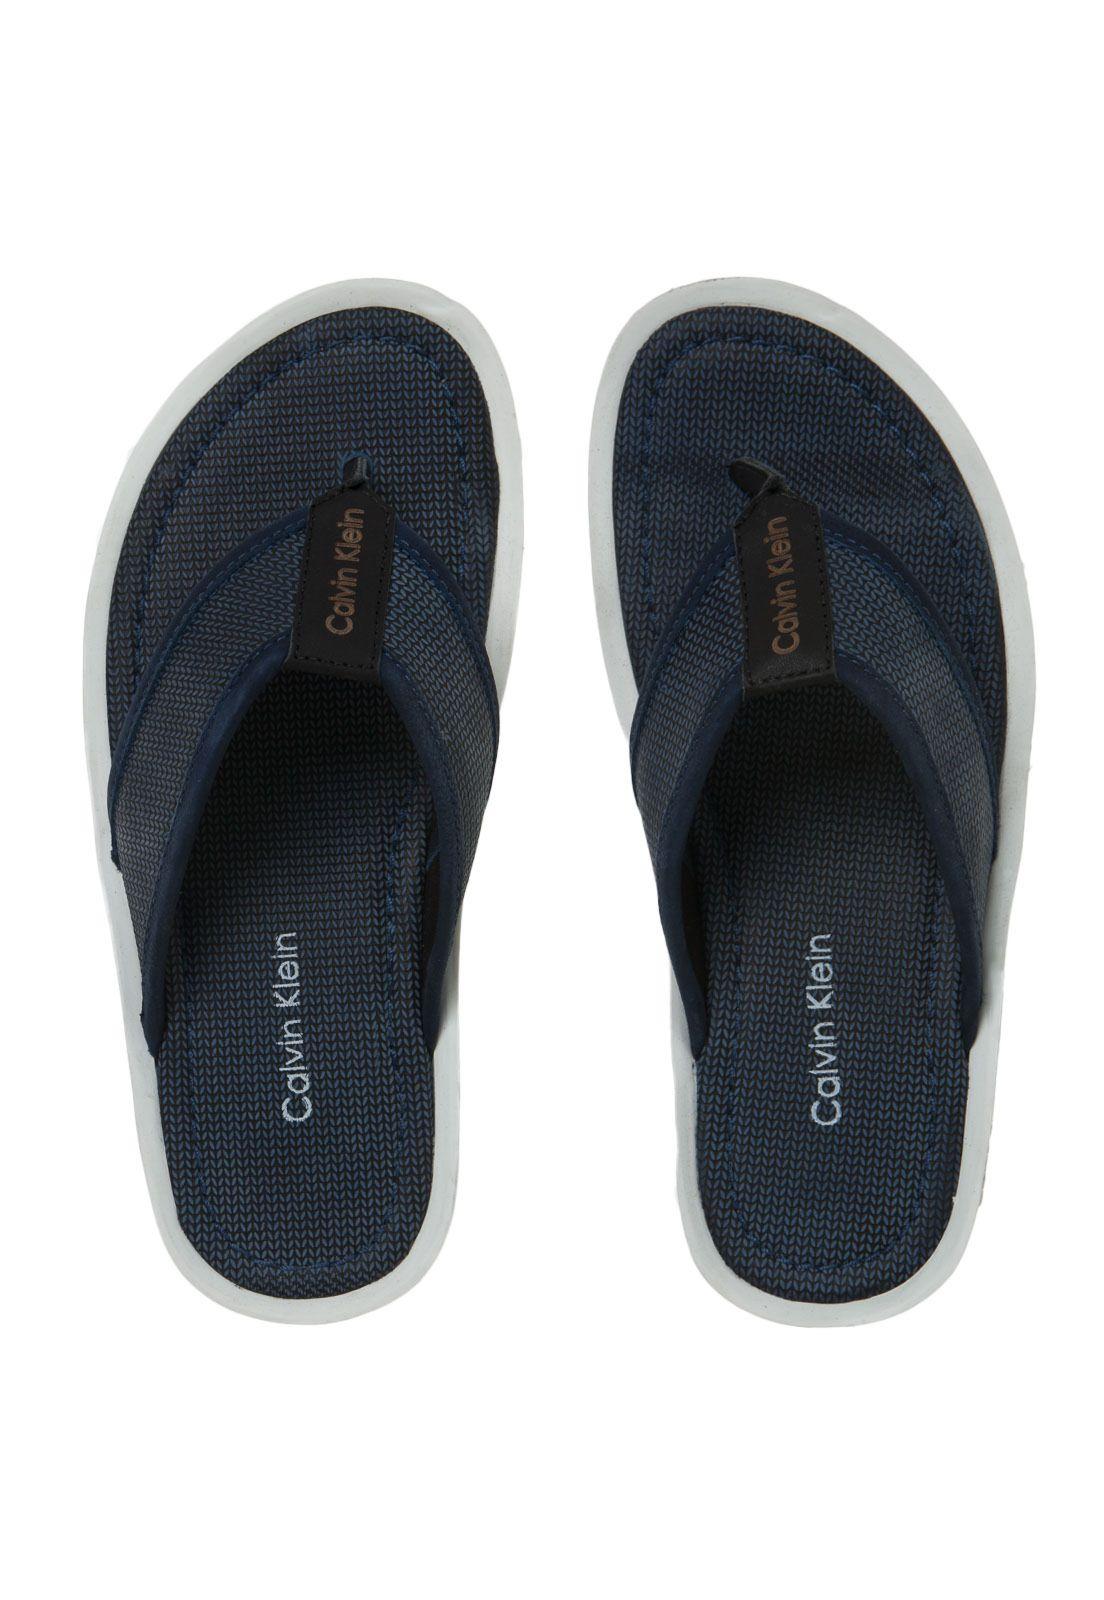 47a4923b7 Chinelo Calvin Klein Sunday Azul   Sneakers and Shoes   Calvin klein ...